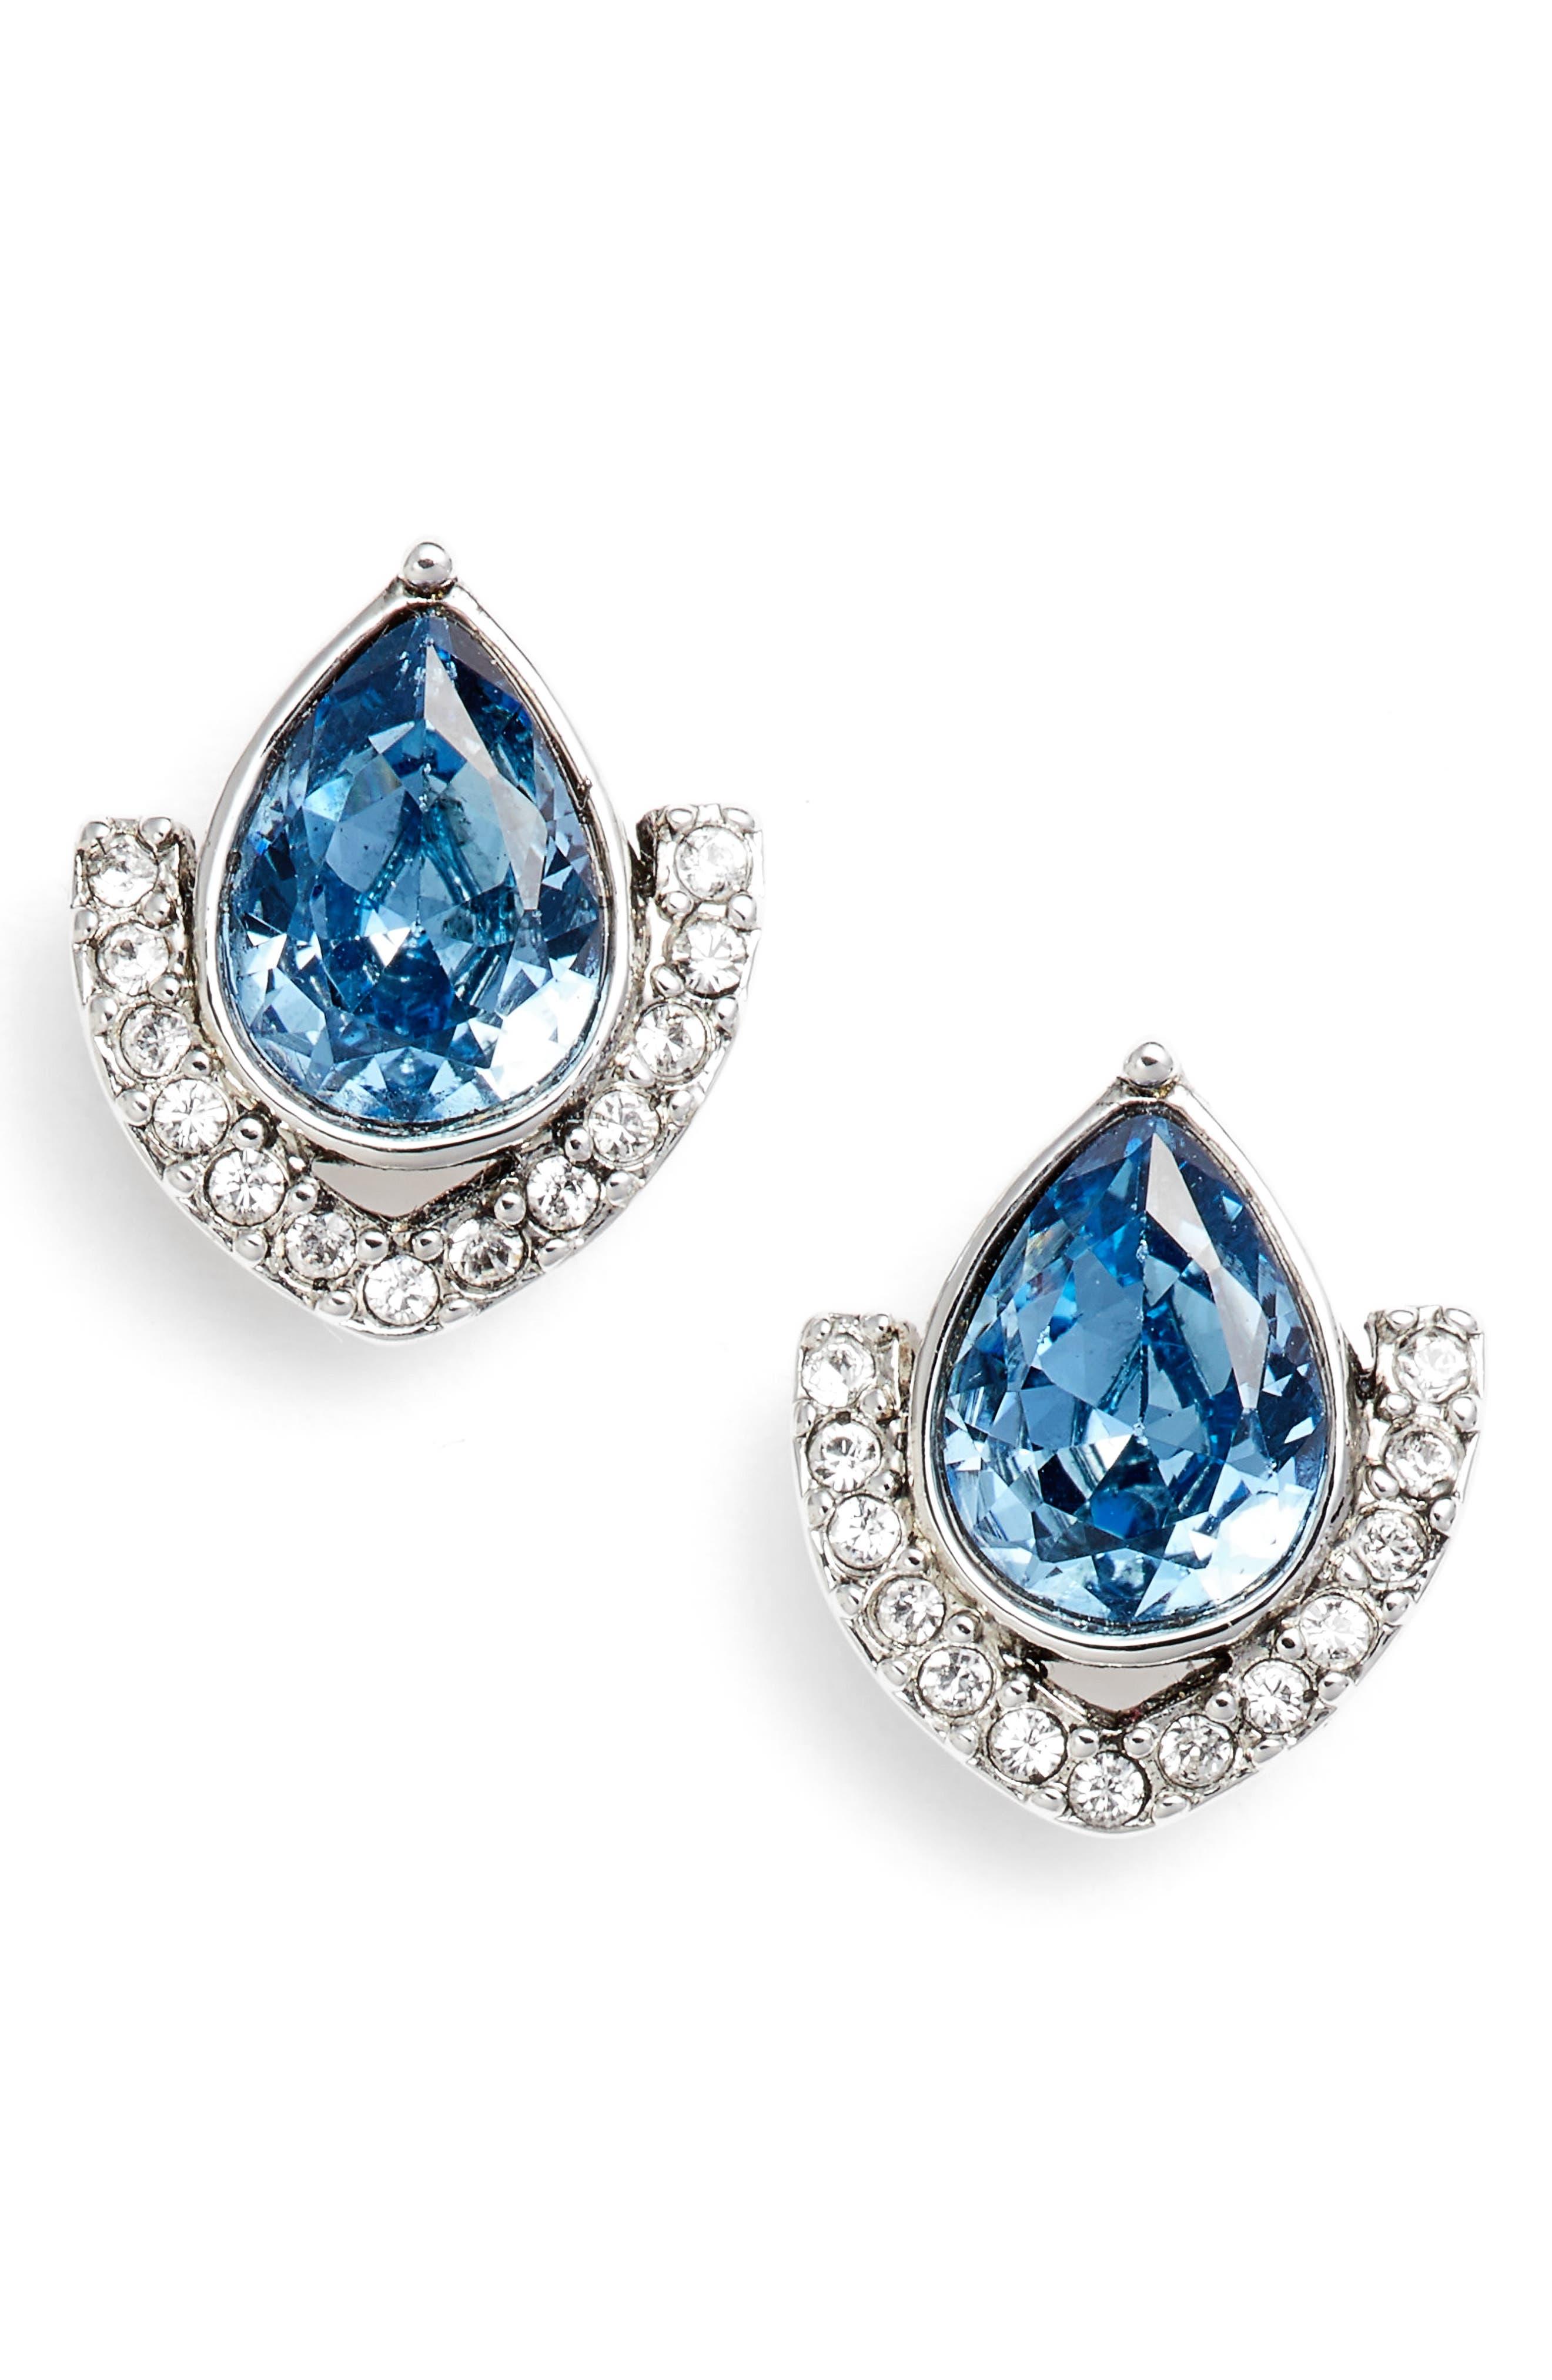 Jenny Packham Stud Earrings